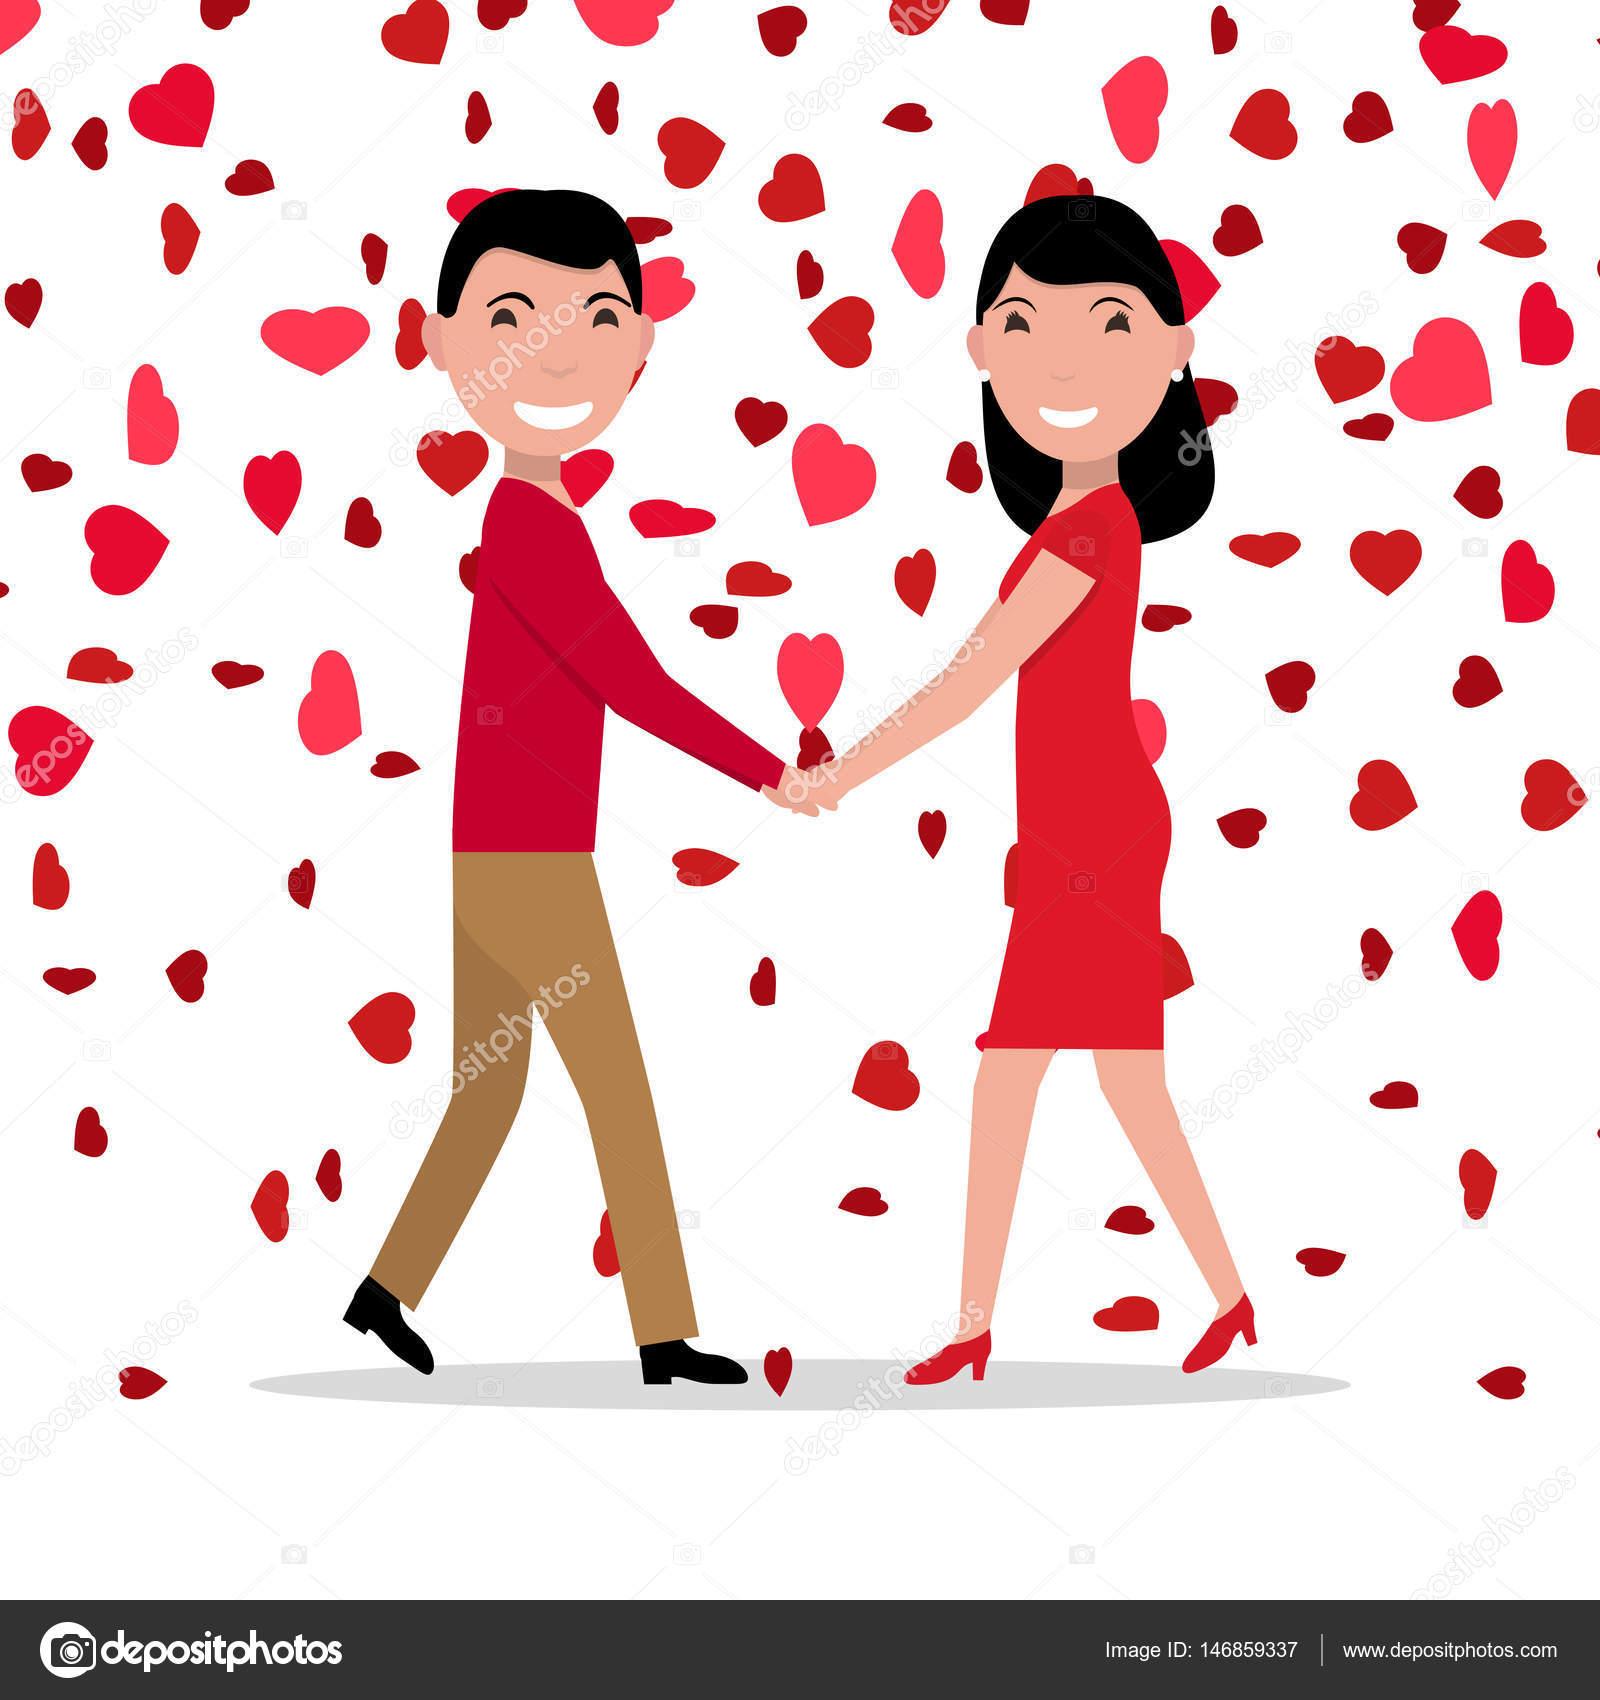 Dibujos Parejas De Amor Pareja De Amor De Dibujos Animados Vector